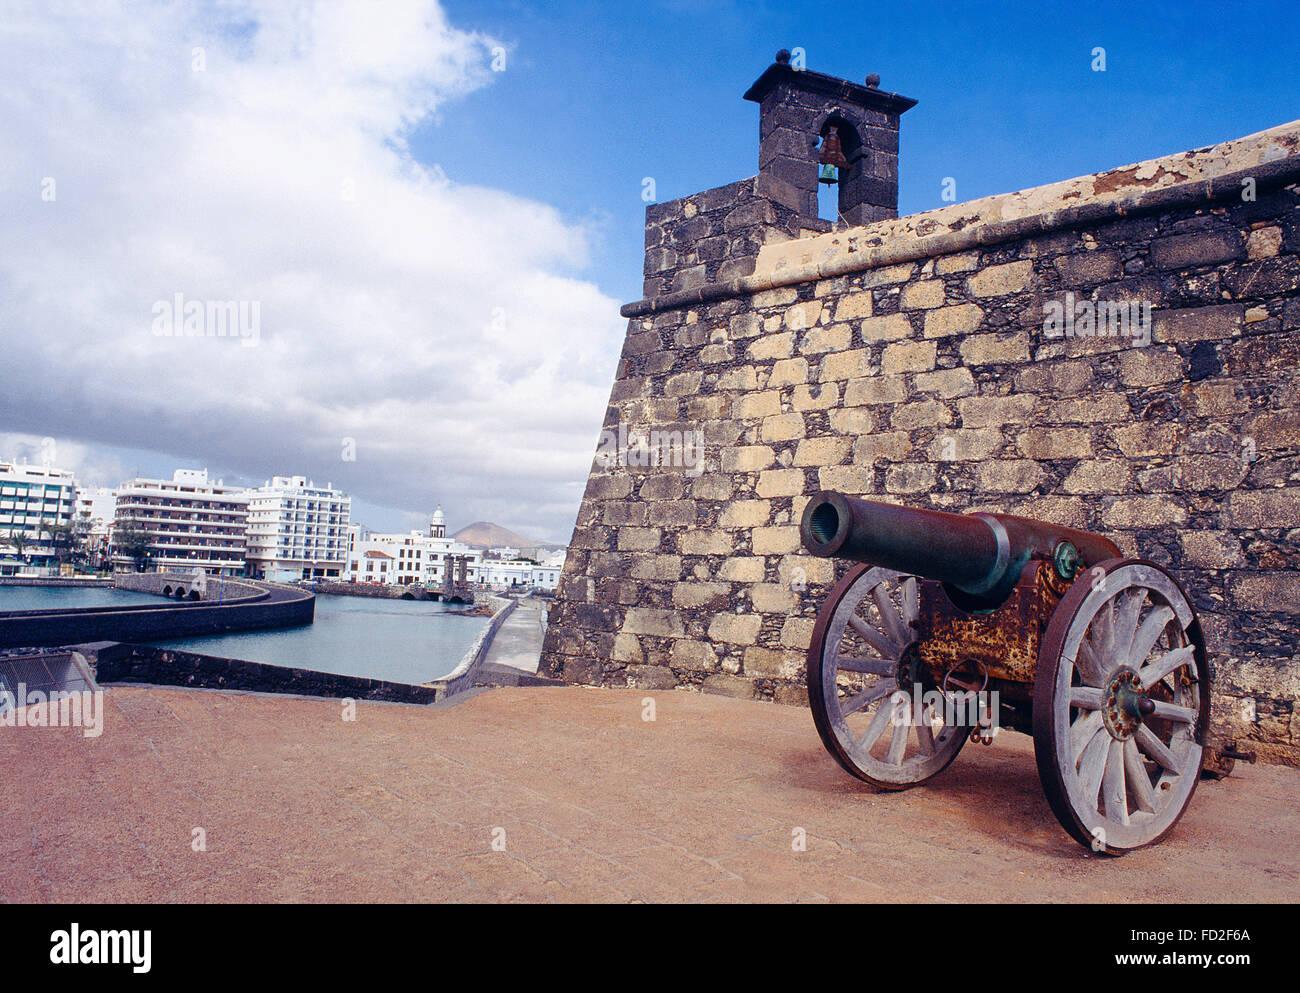 San Gabriel castle. Arrecife, Lanzarote island, Canary Islands, Spain. - Stock Image